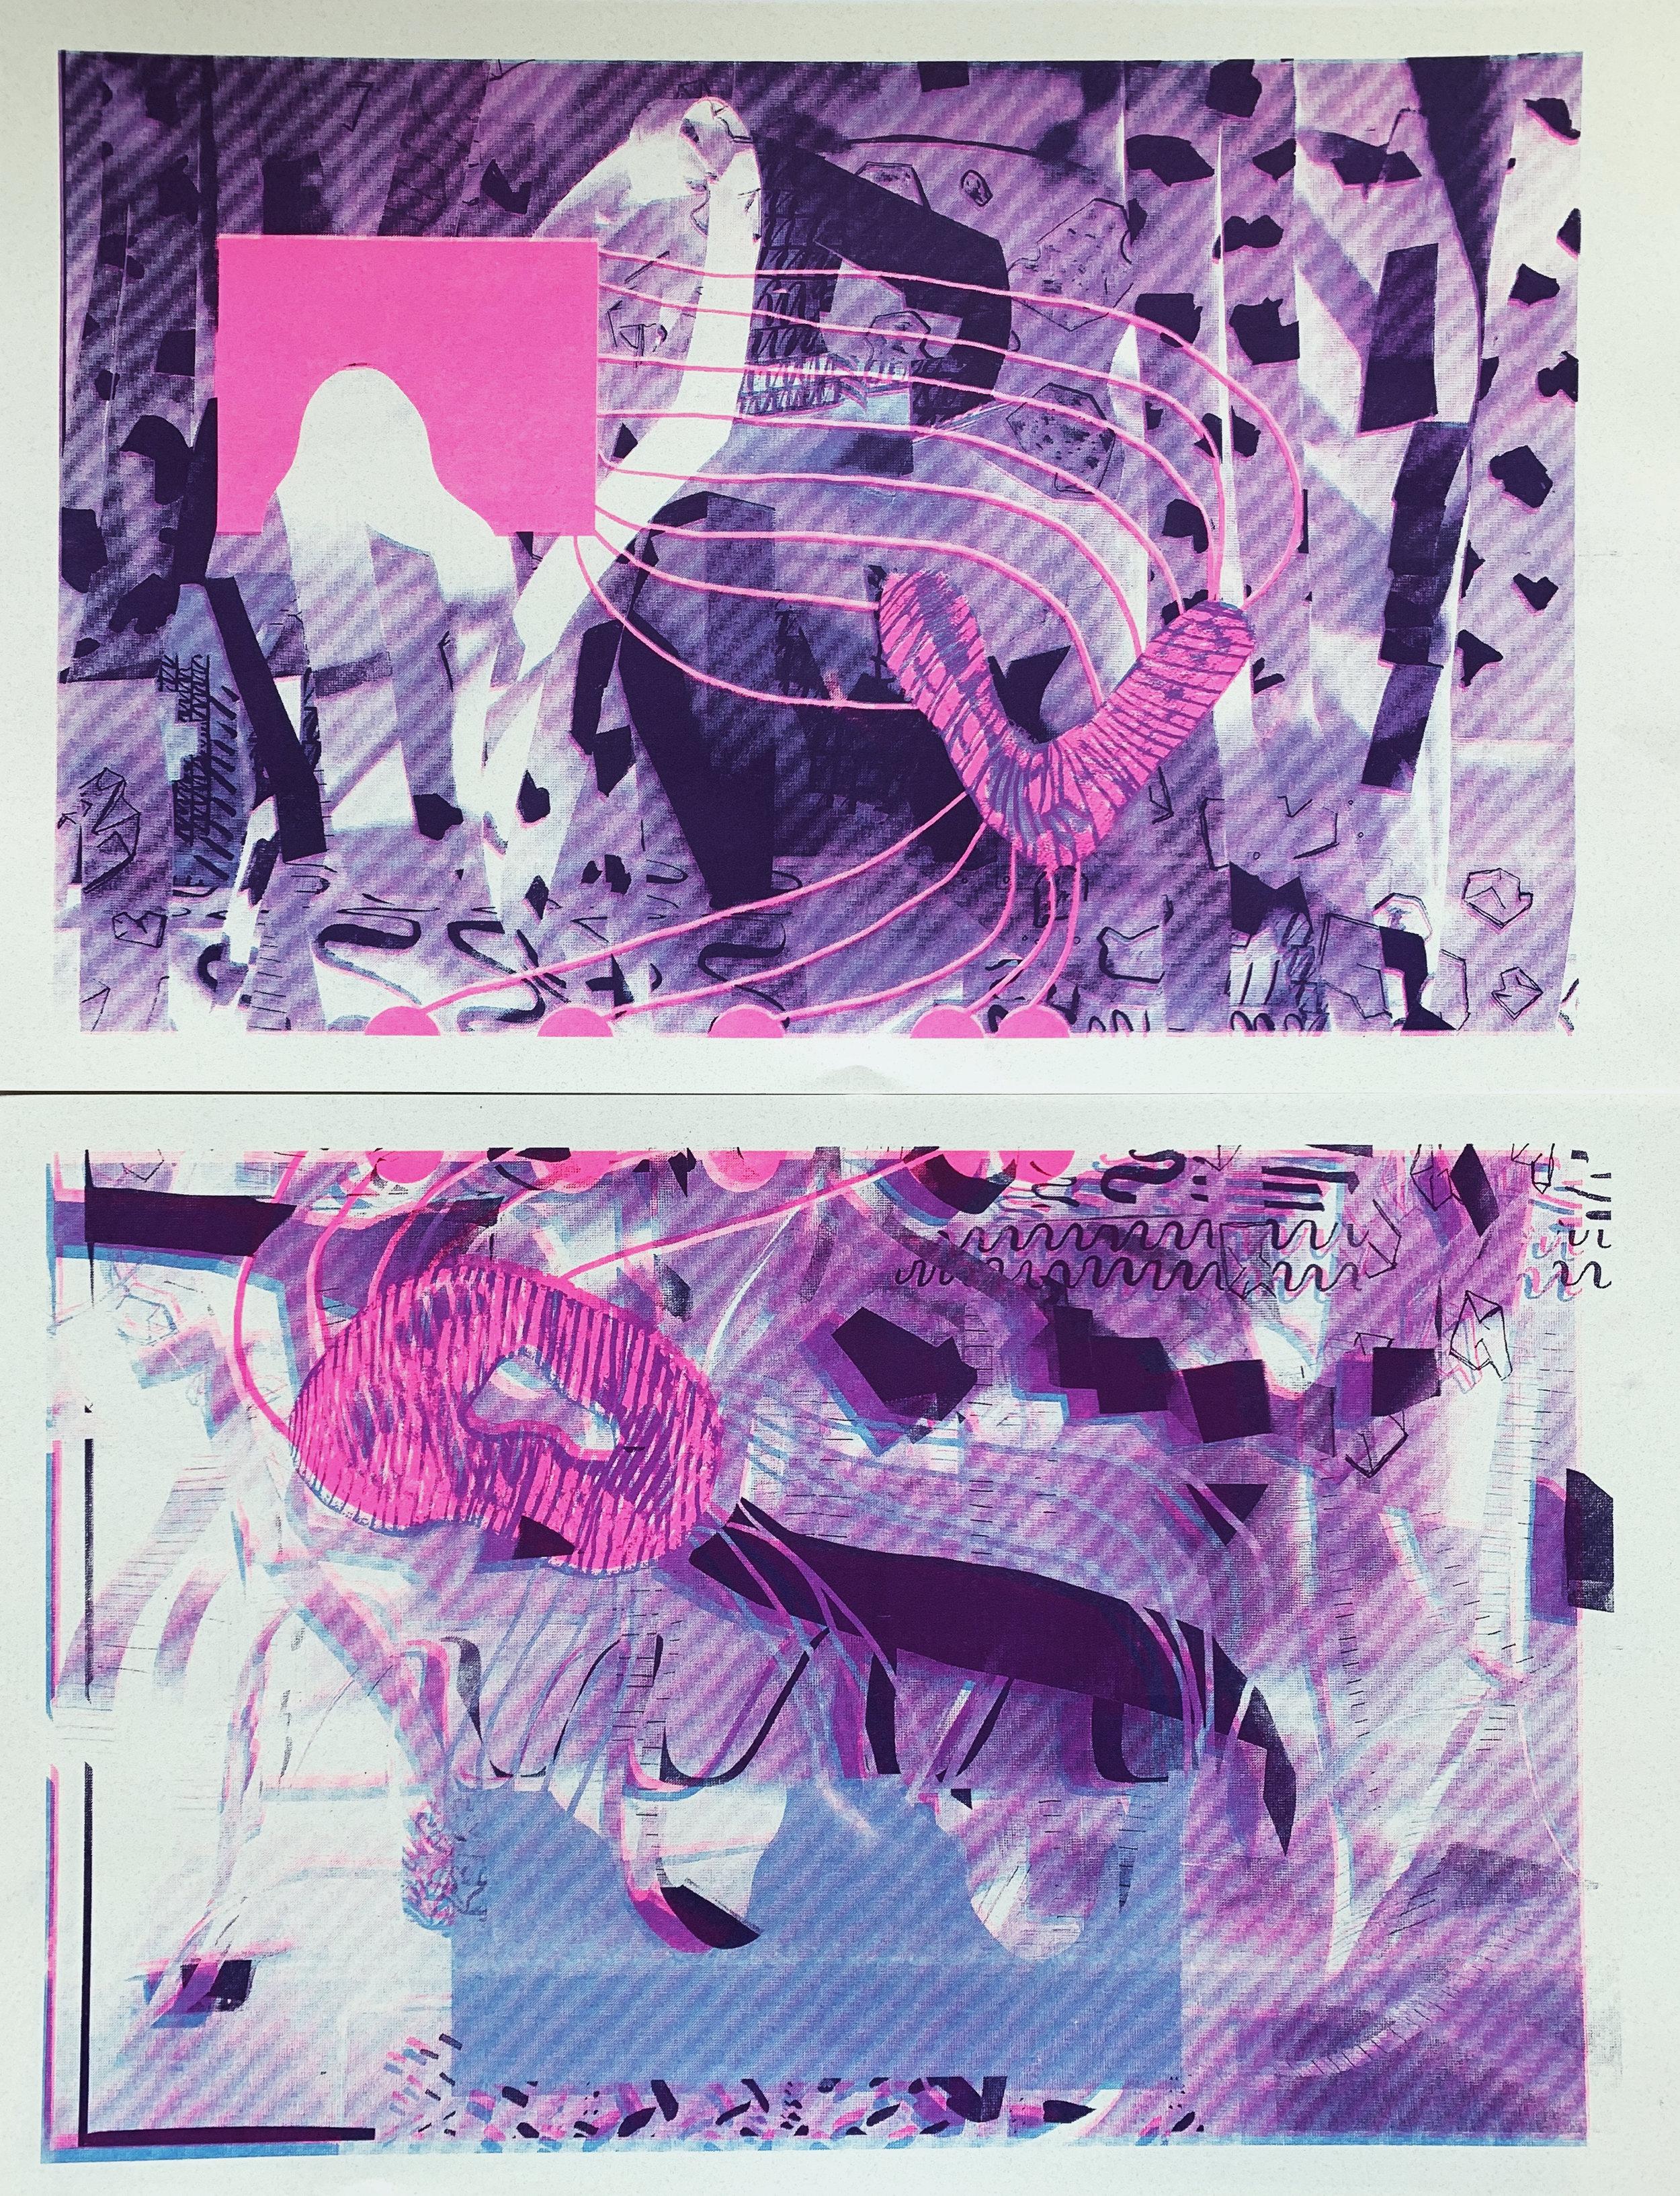 Risograph Print titled AVOW